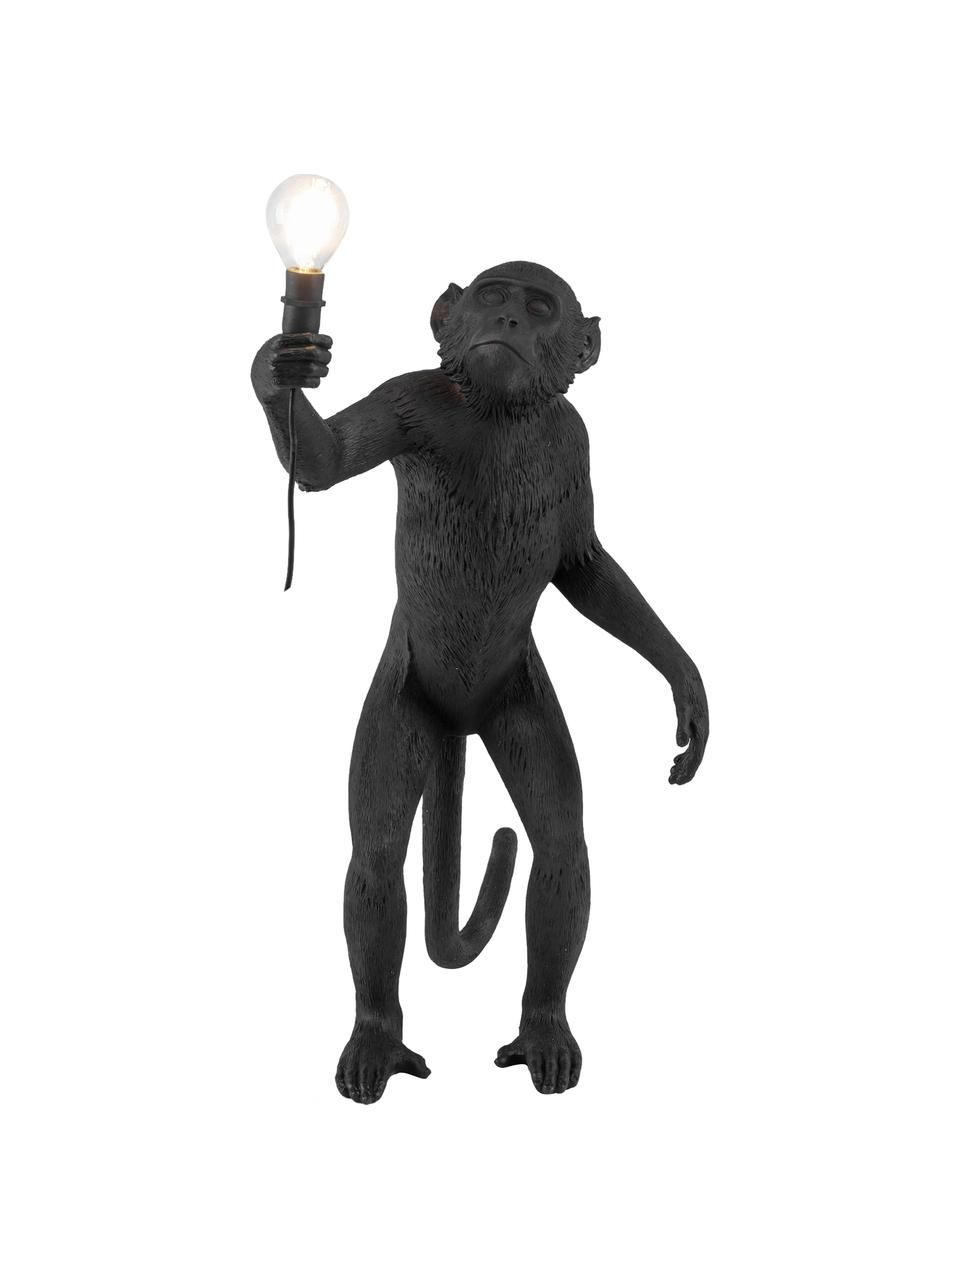 Lampada da tavolo a LED da esterno Monkey, Resina, Nero, Larg. 46 x Alt. 54 cm